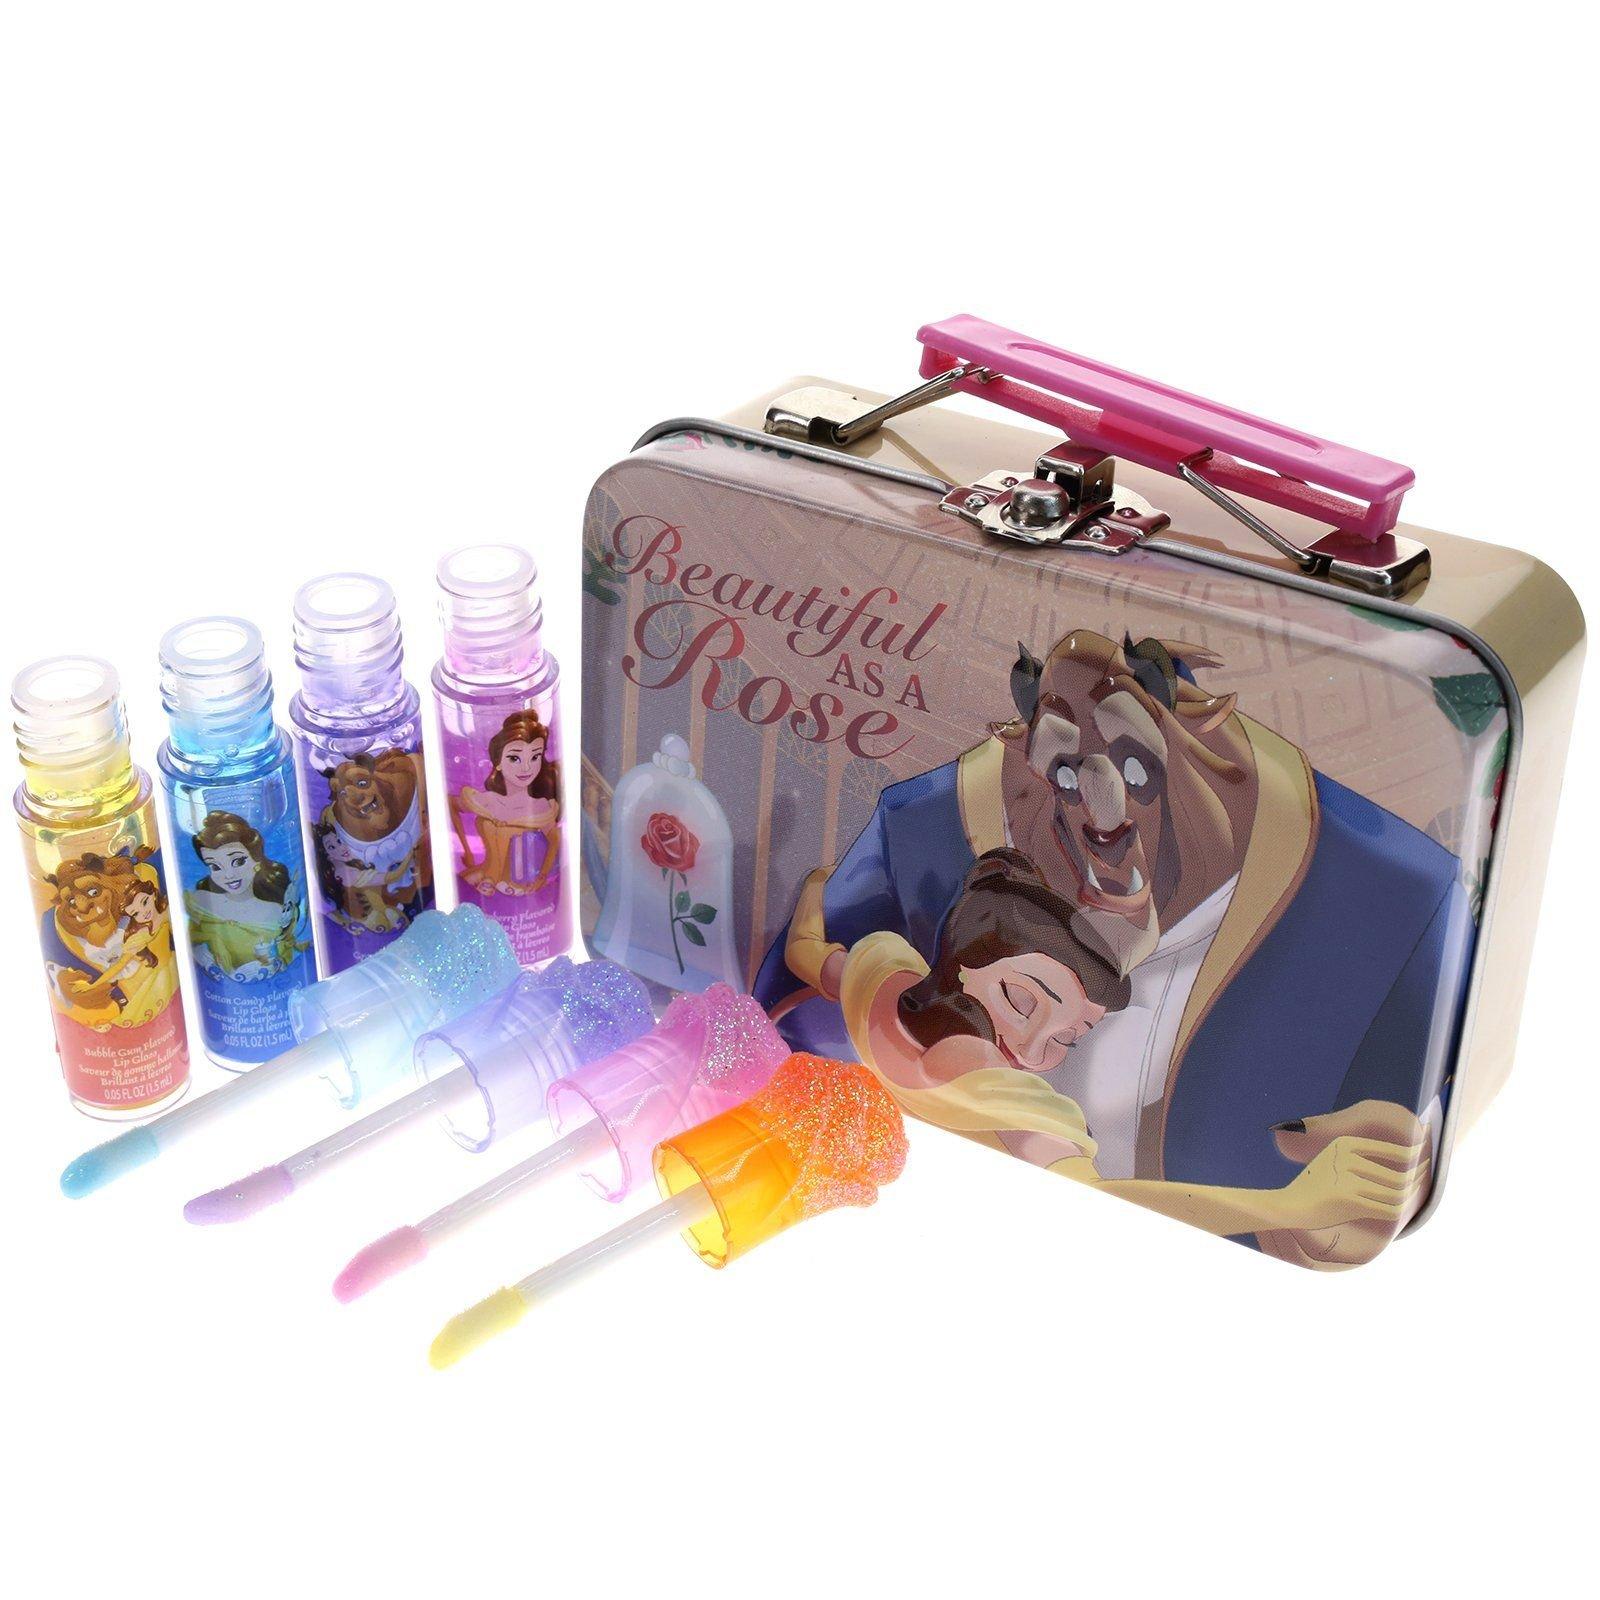 Townley Girl Disney Princess Non Toxic Peel Off Nail: Amazon.com : Tangled Townley Girl 4 Piece Super Sparkly